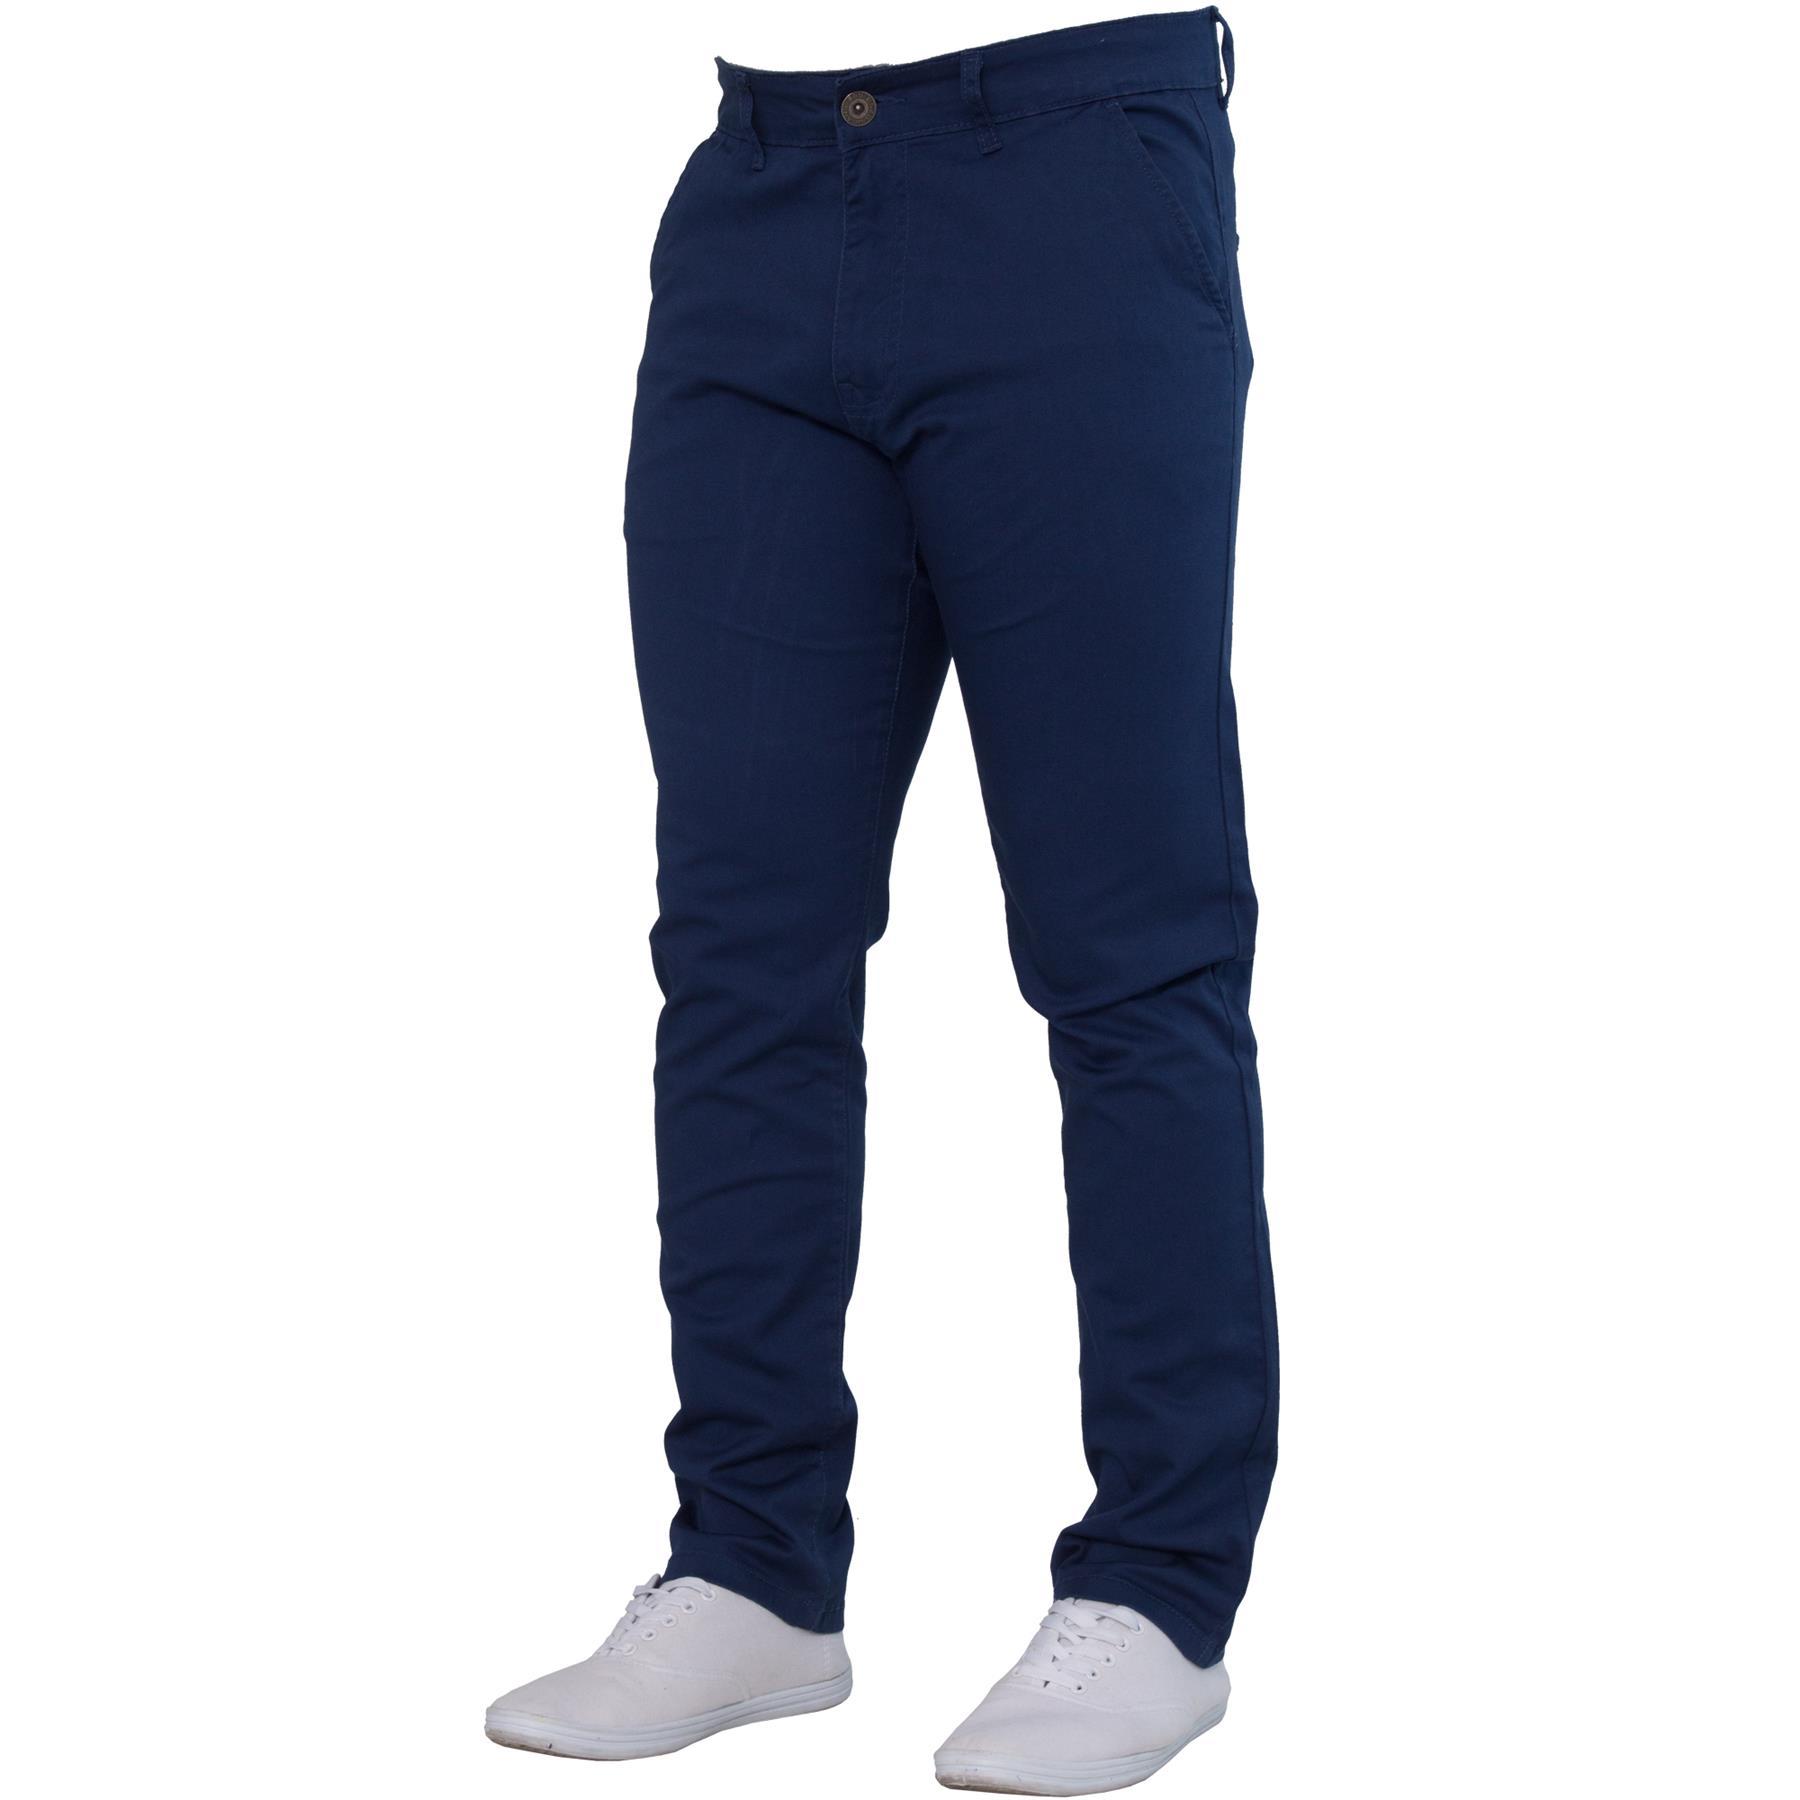 Enzo-Mens-Big-Tall-Jeans-Leg-King-Size-Denim-Pants-Chino-Trousers-Pants-44-034-60-034 thumbnail 8